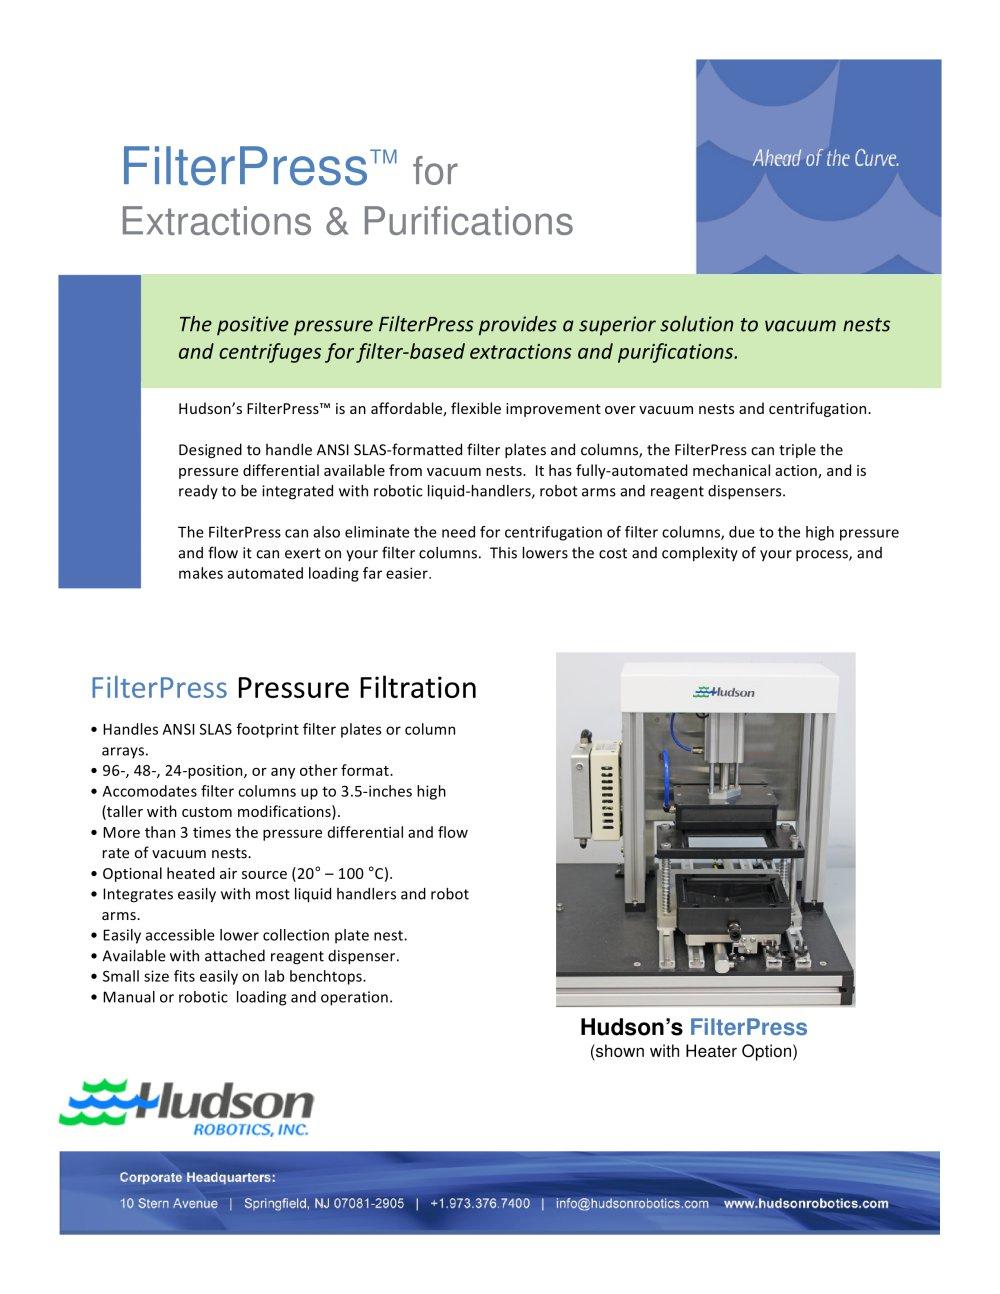 Filterpress For Extractions Purifications Hudson Robotics Pdf